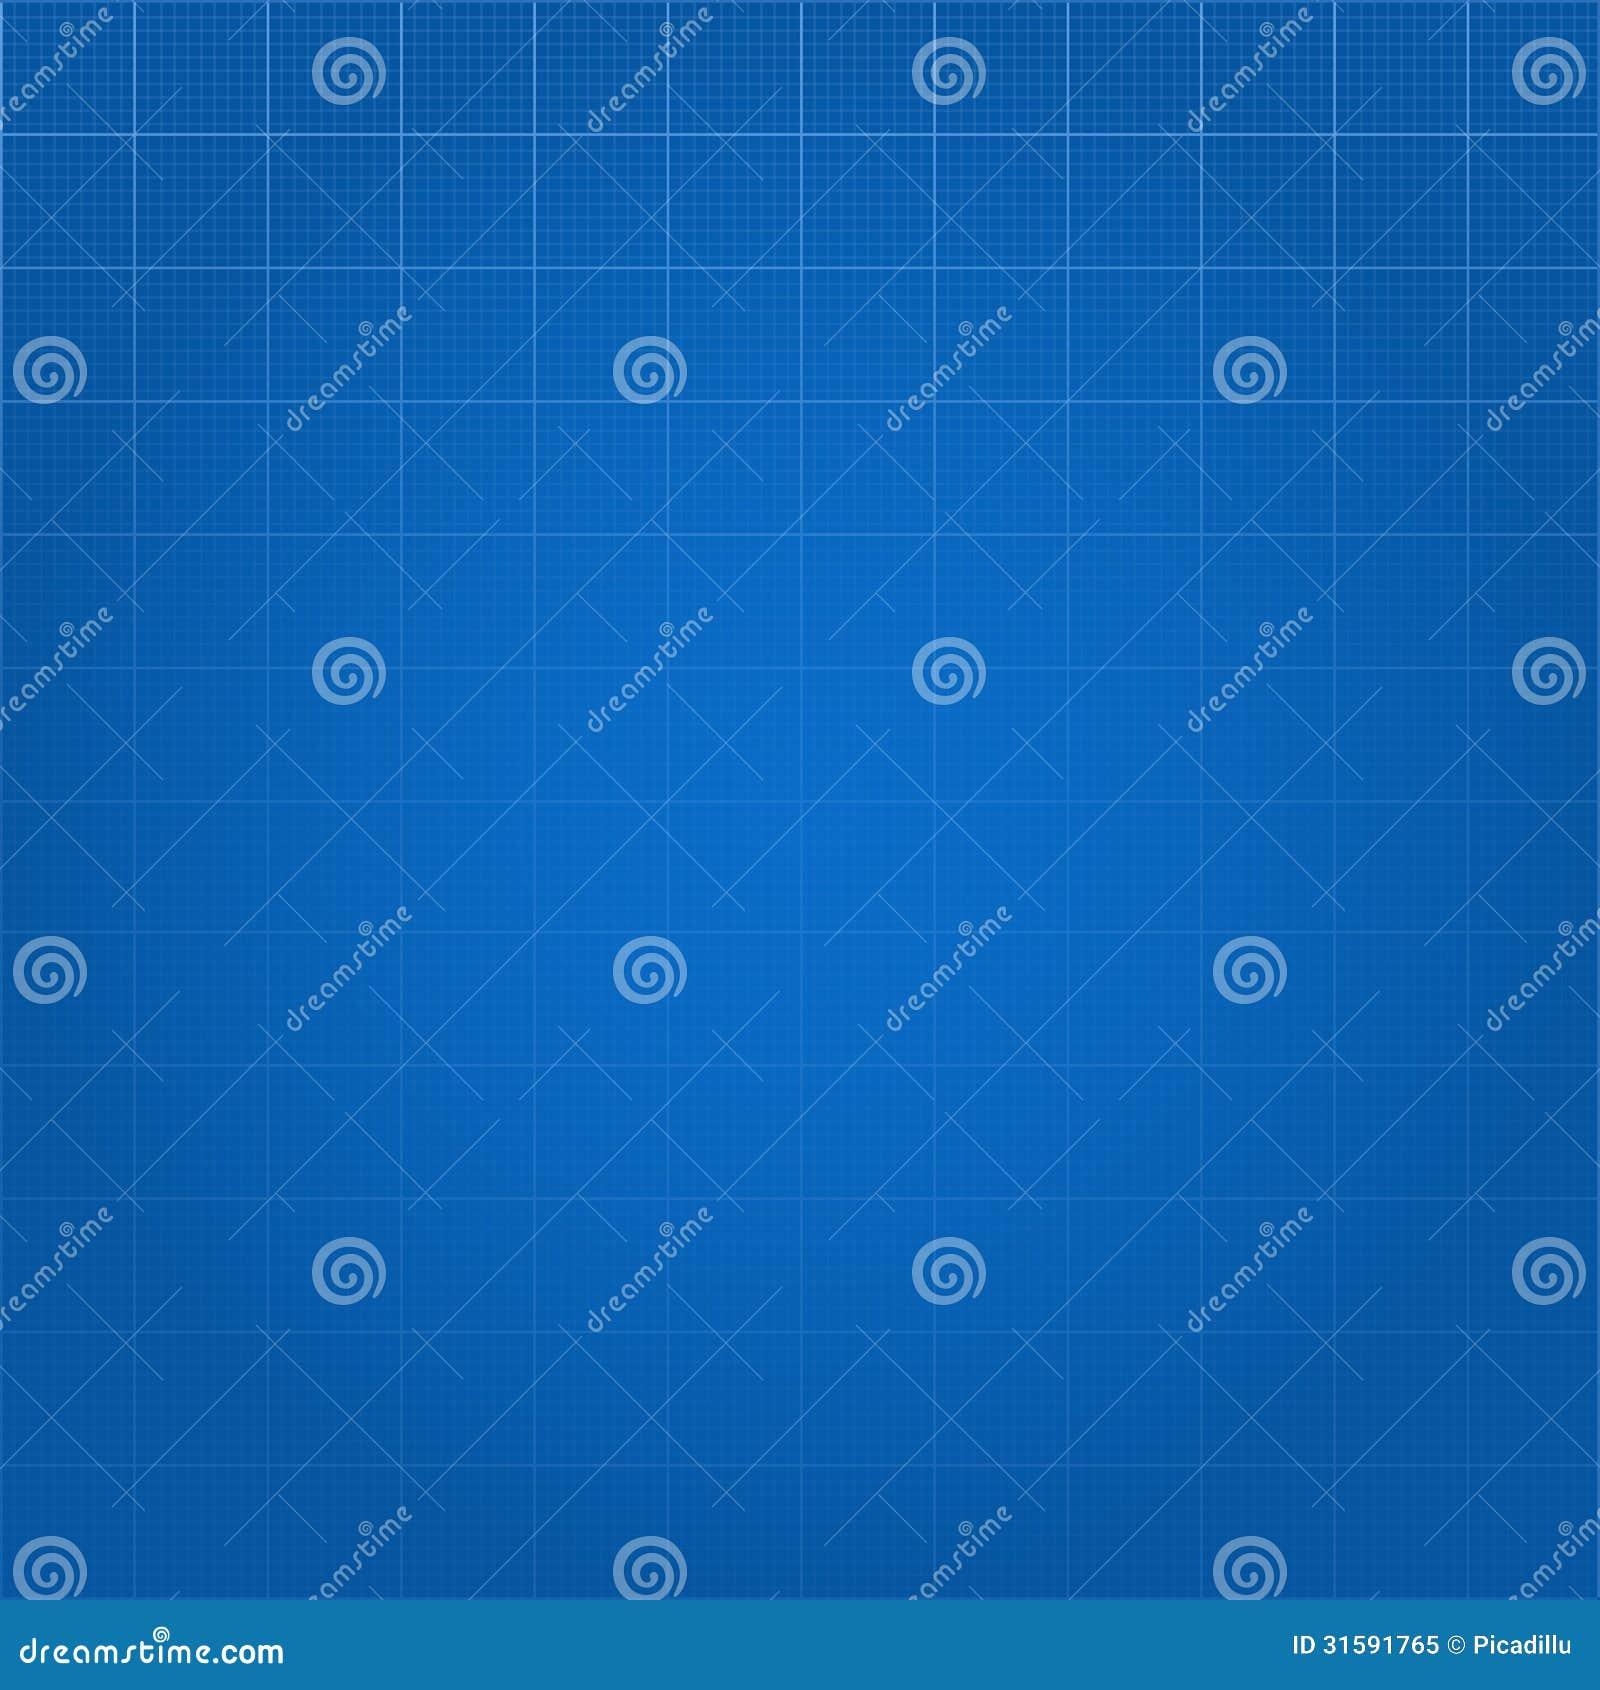 Blueprint paper background stock vector image of illustration royalty free stock photo malvernweather Choice Image